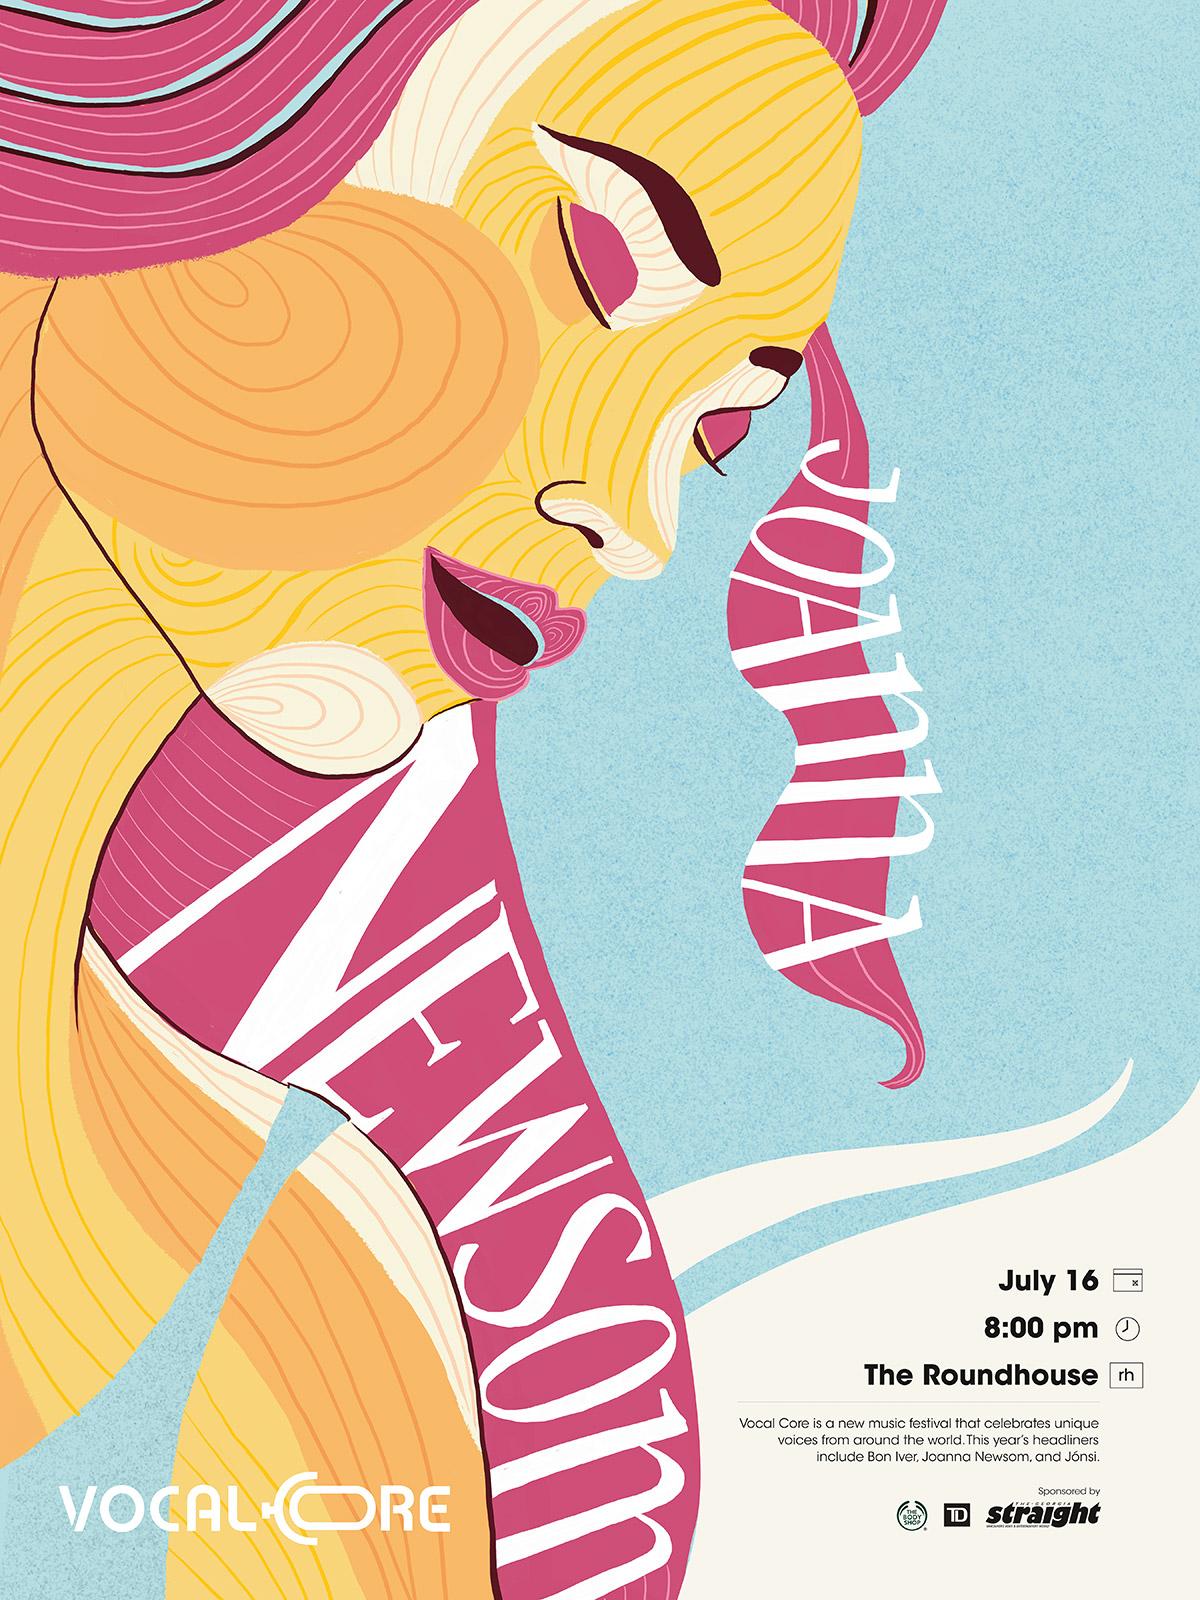 Vocal-Core-Music-Festival-Joanna-Newsome-Poster-illustration-and-design-by-Fiona-Dunnett.jpg